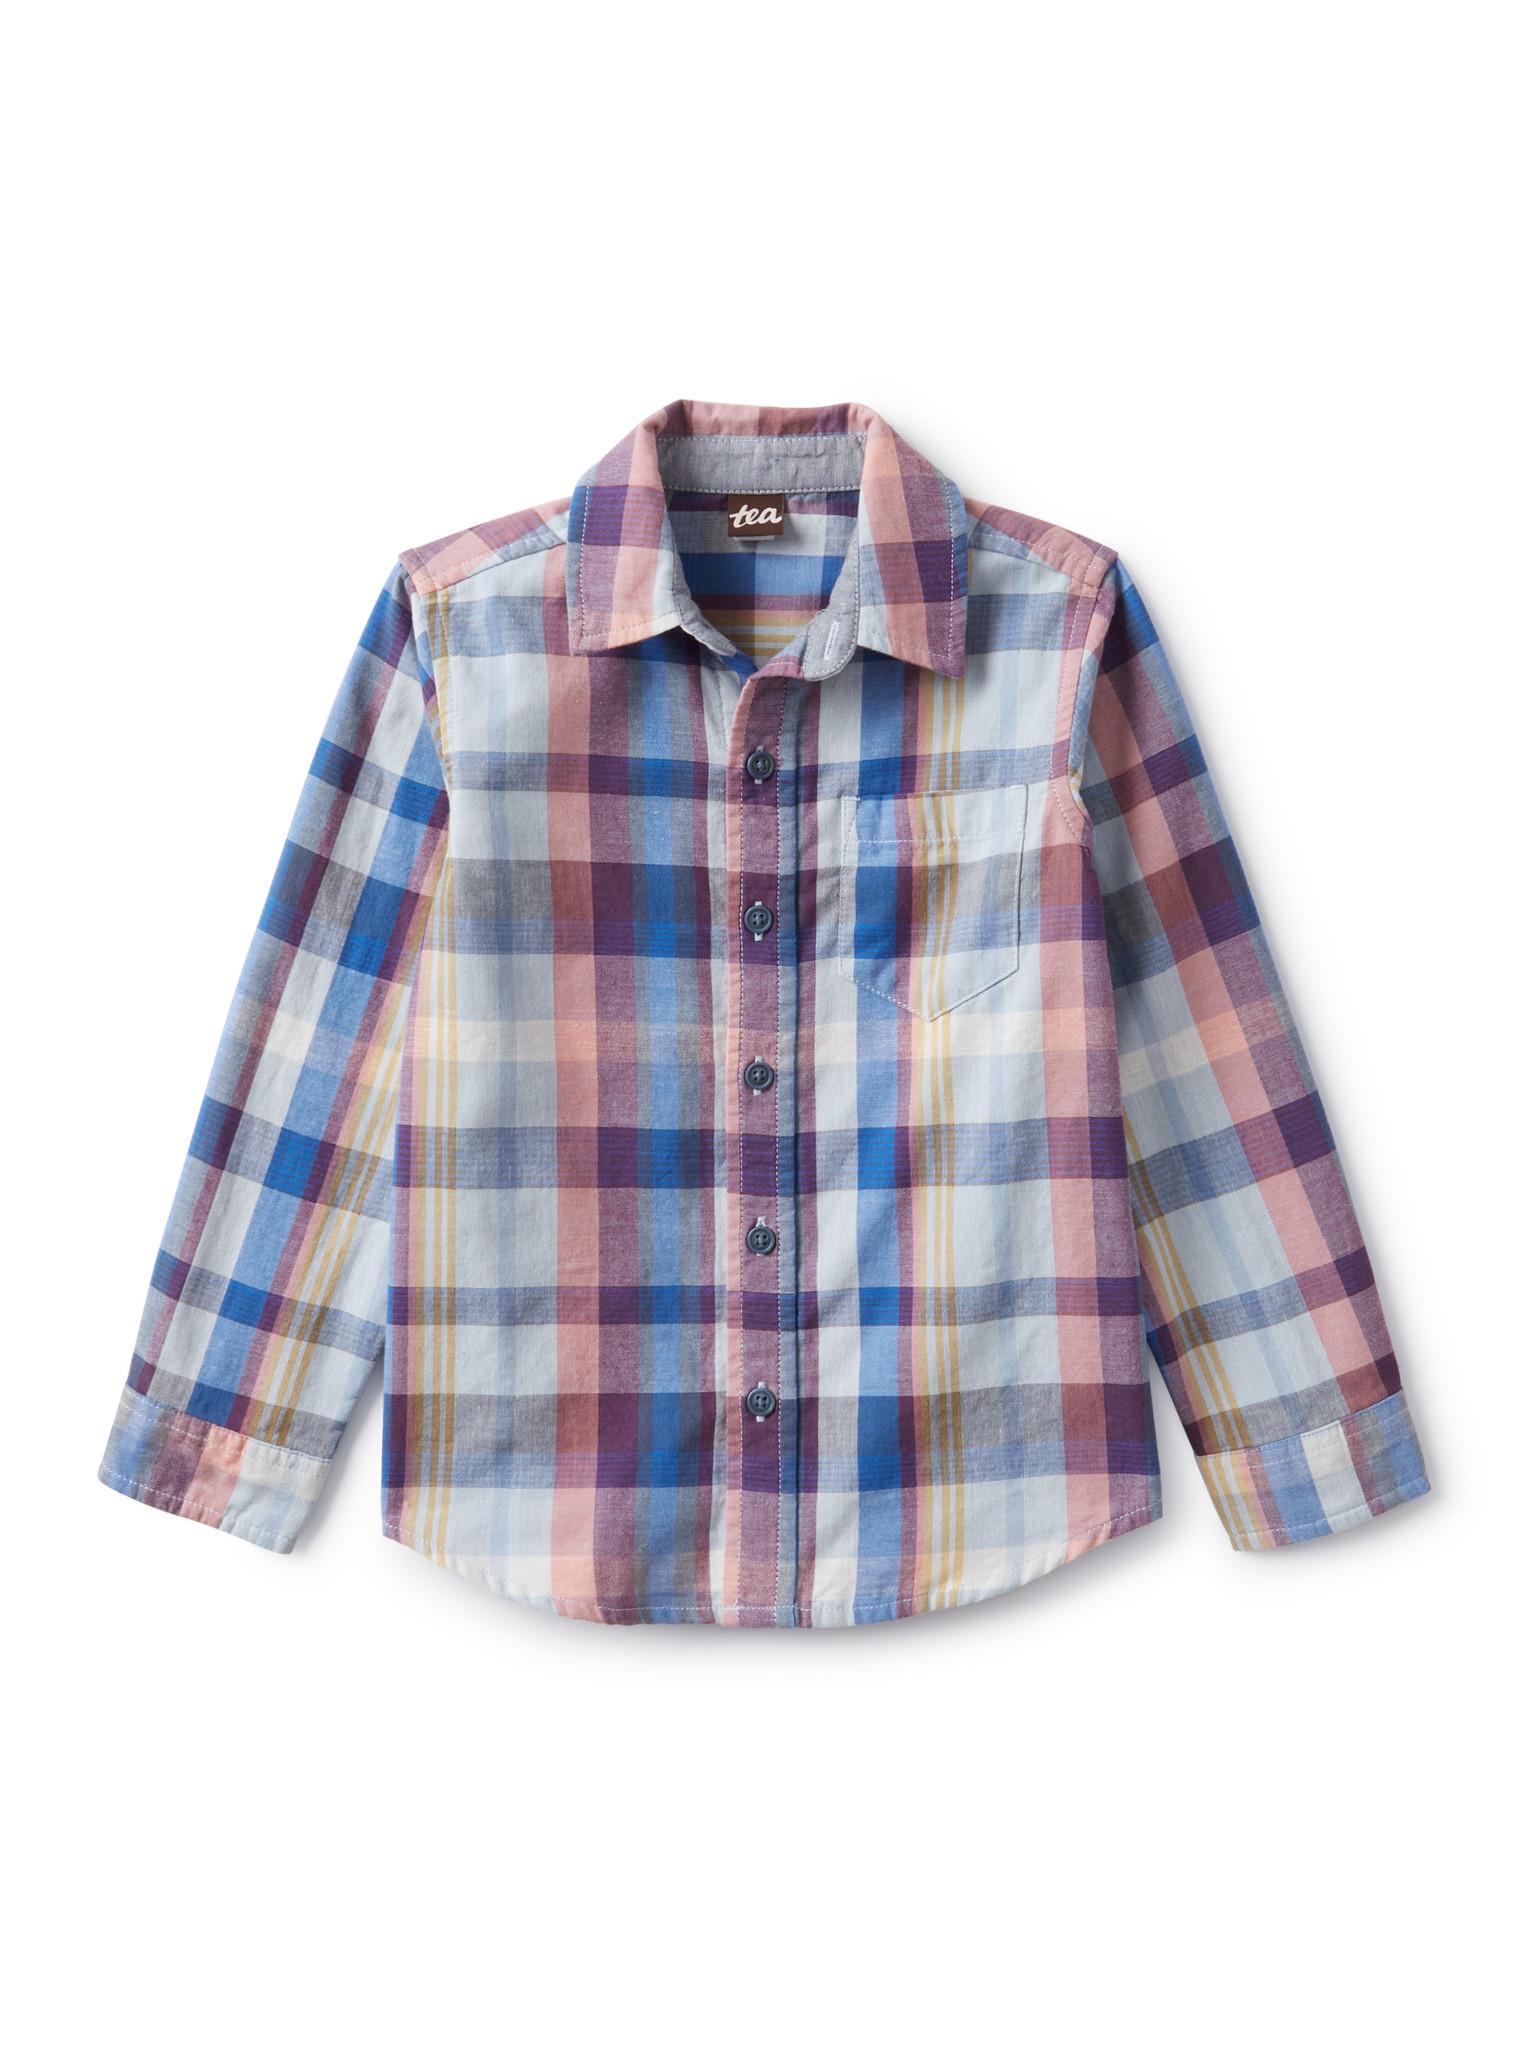 Tea Collection Plaid Button Up Shirt